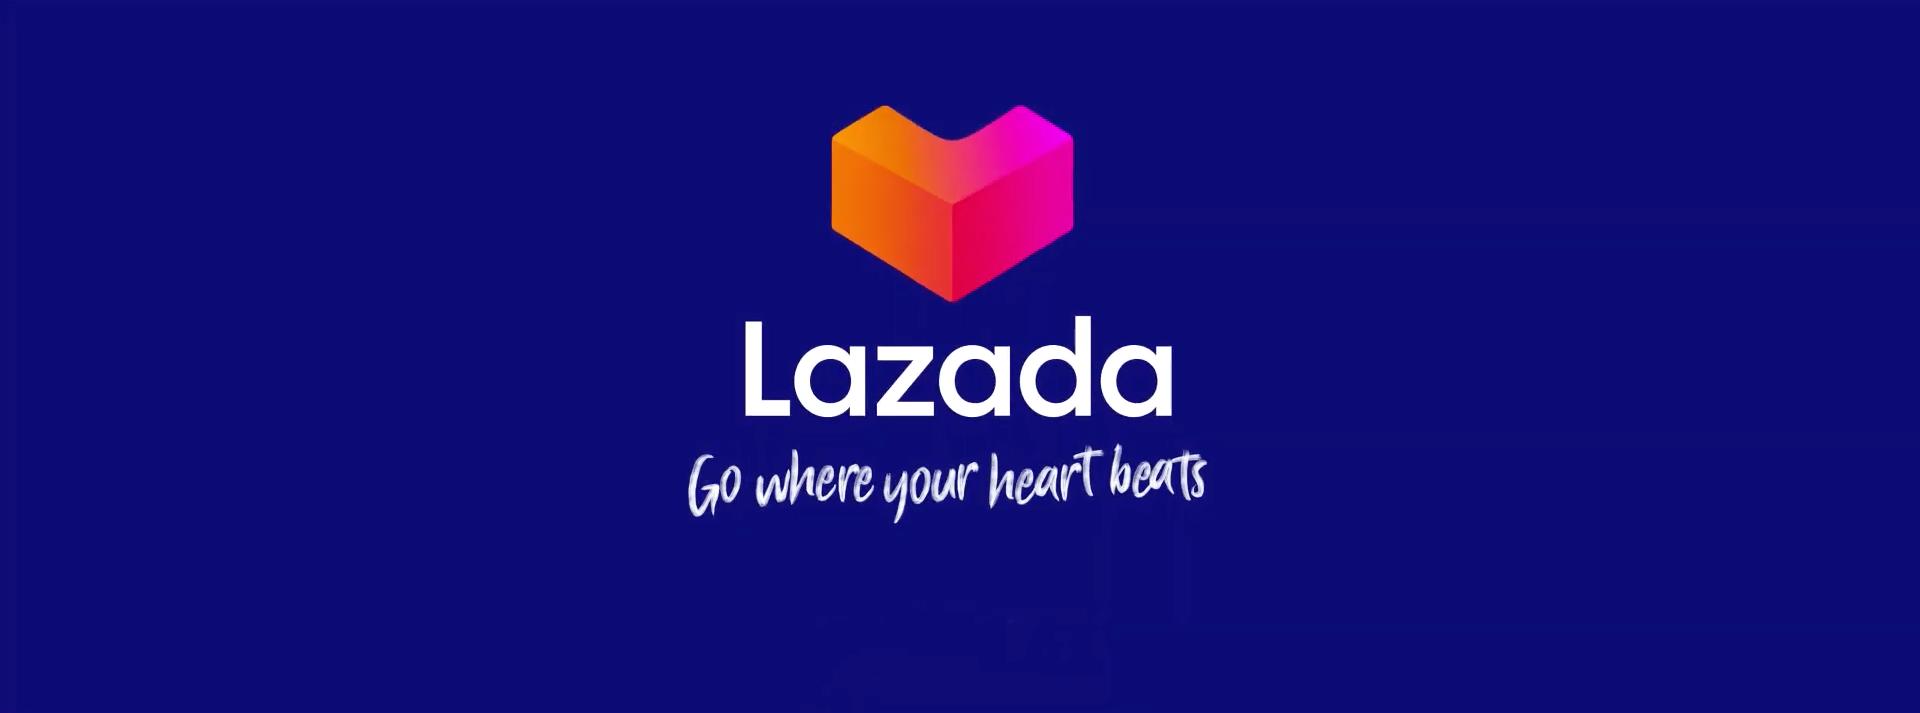 Lazada รีแบรนด์ใหม่ เป็นกล่องรูปตัว L สะท้อนถึงความมีชีวิตชีวาใน ...